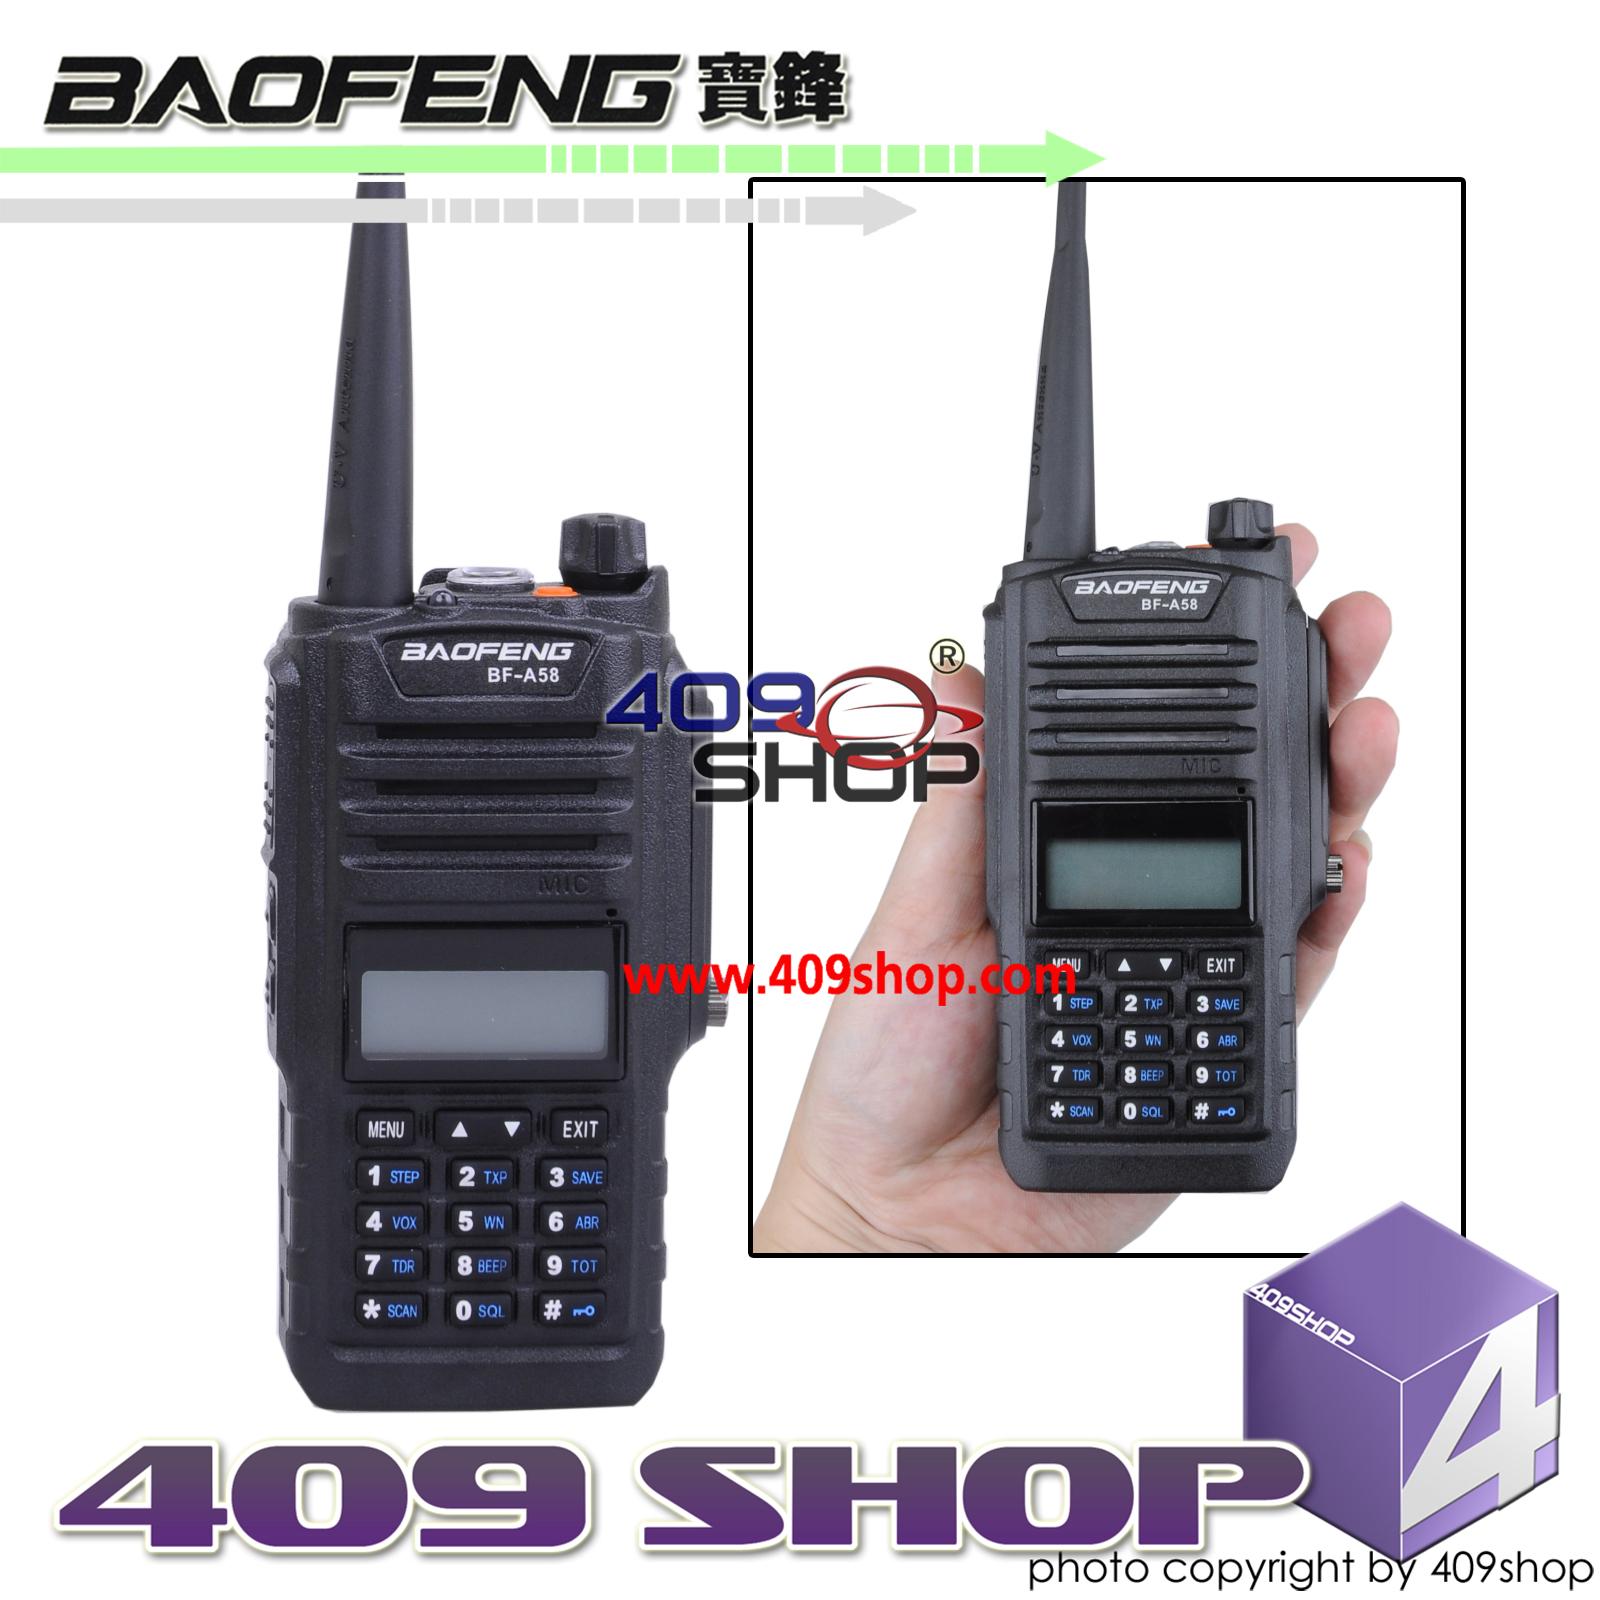 BAOFENG BF-A58 WATERPROOF